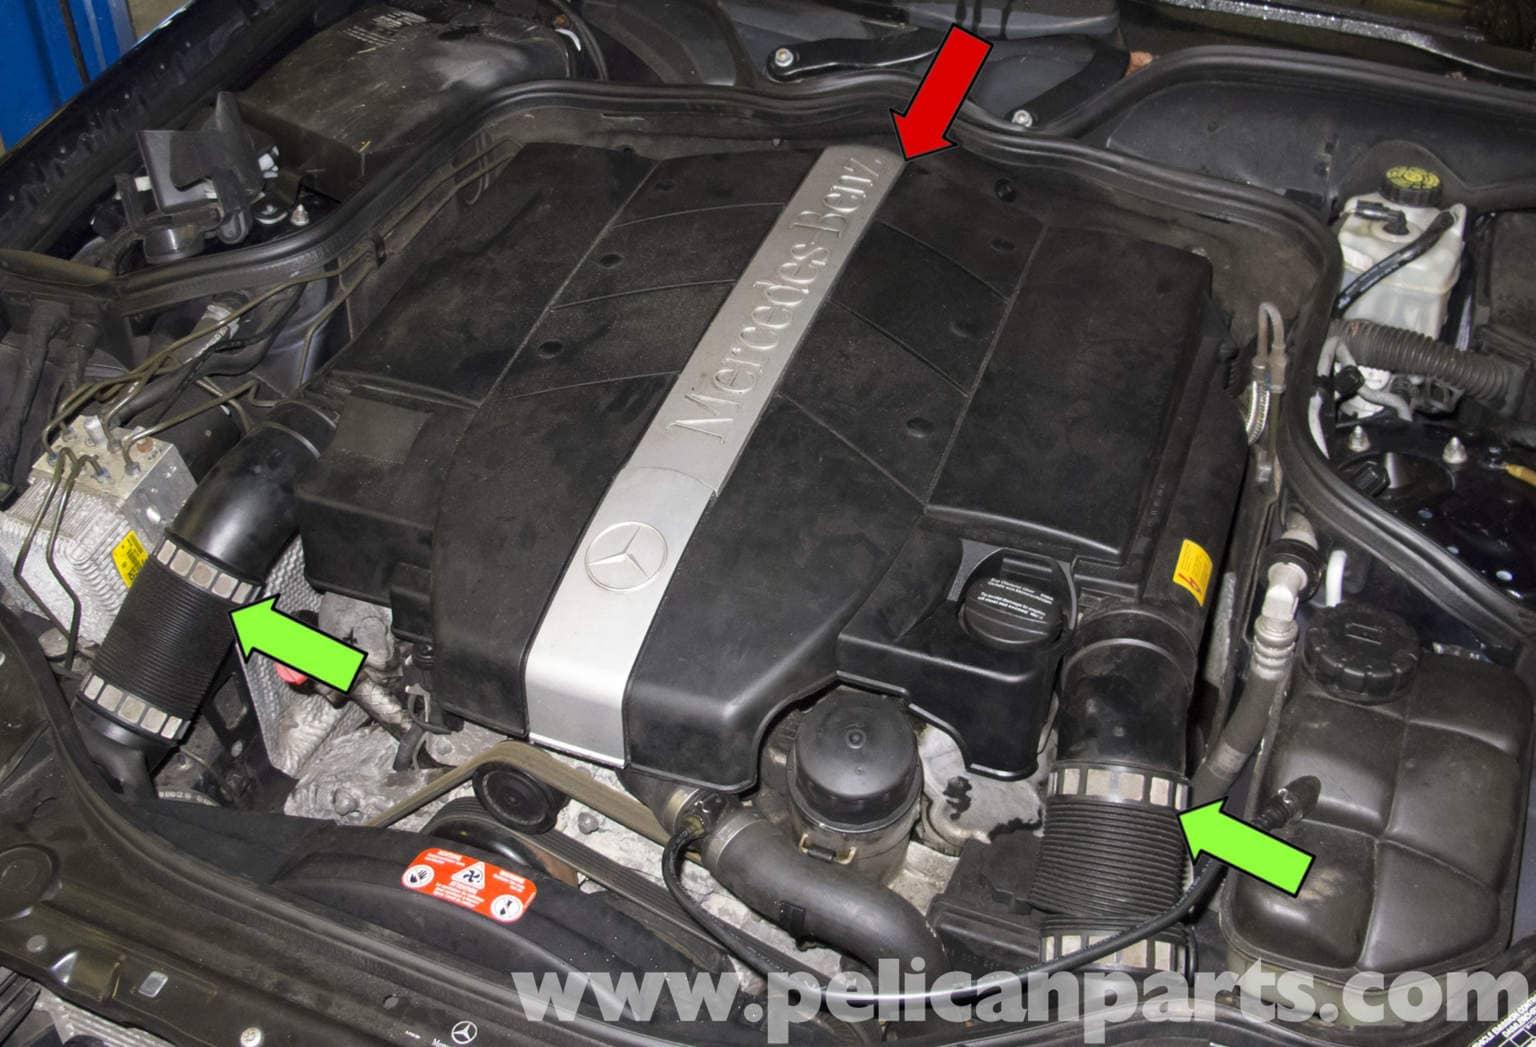 Mercedes Benz W211 Crankshaft Position Sensor Replacement